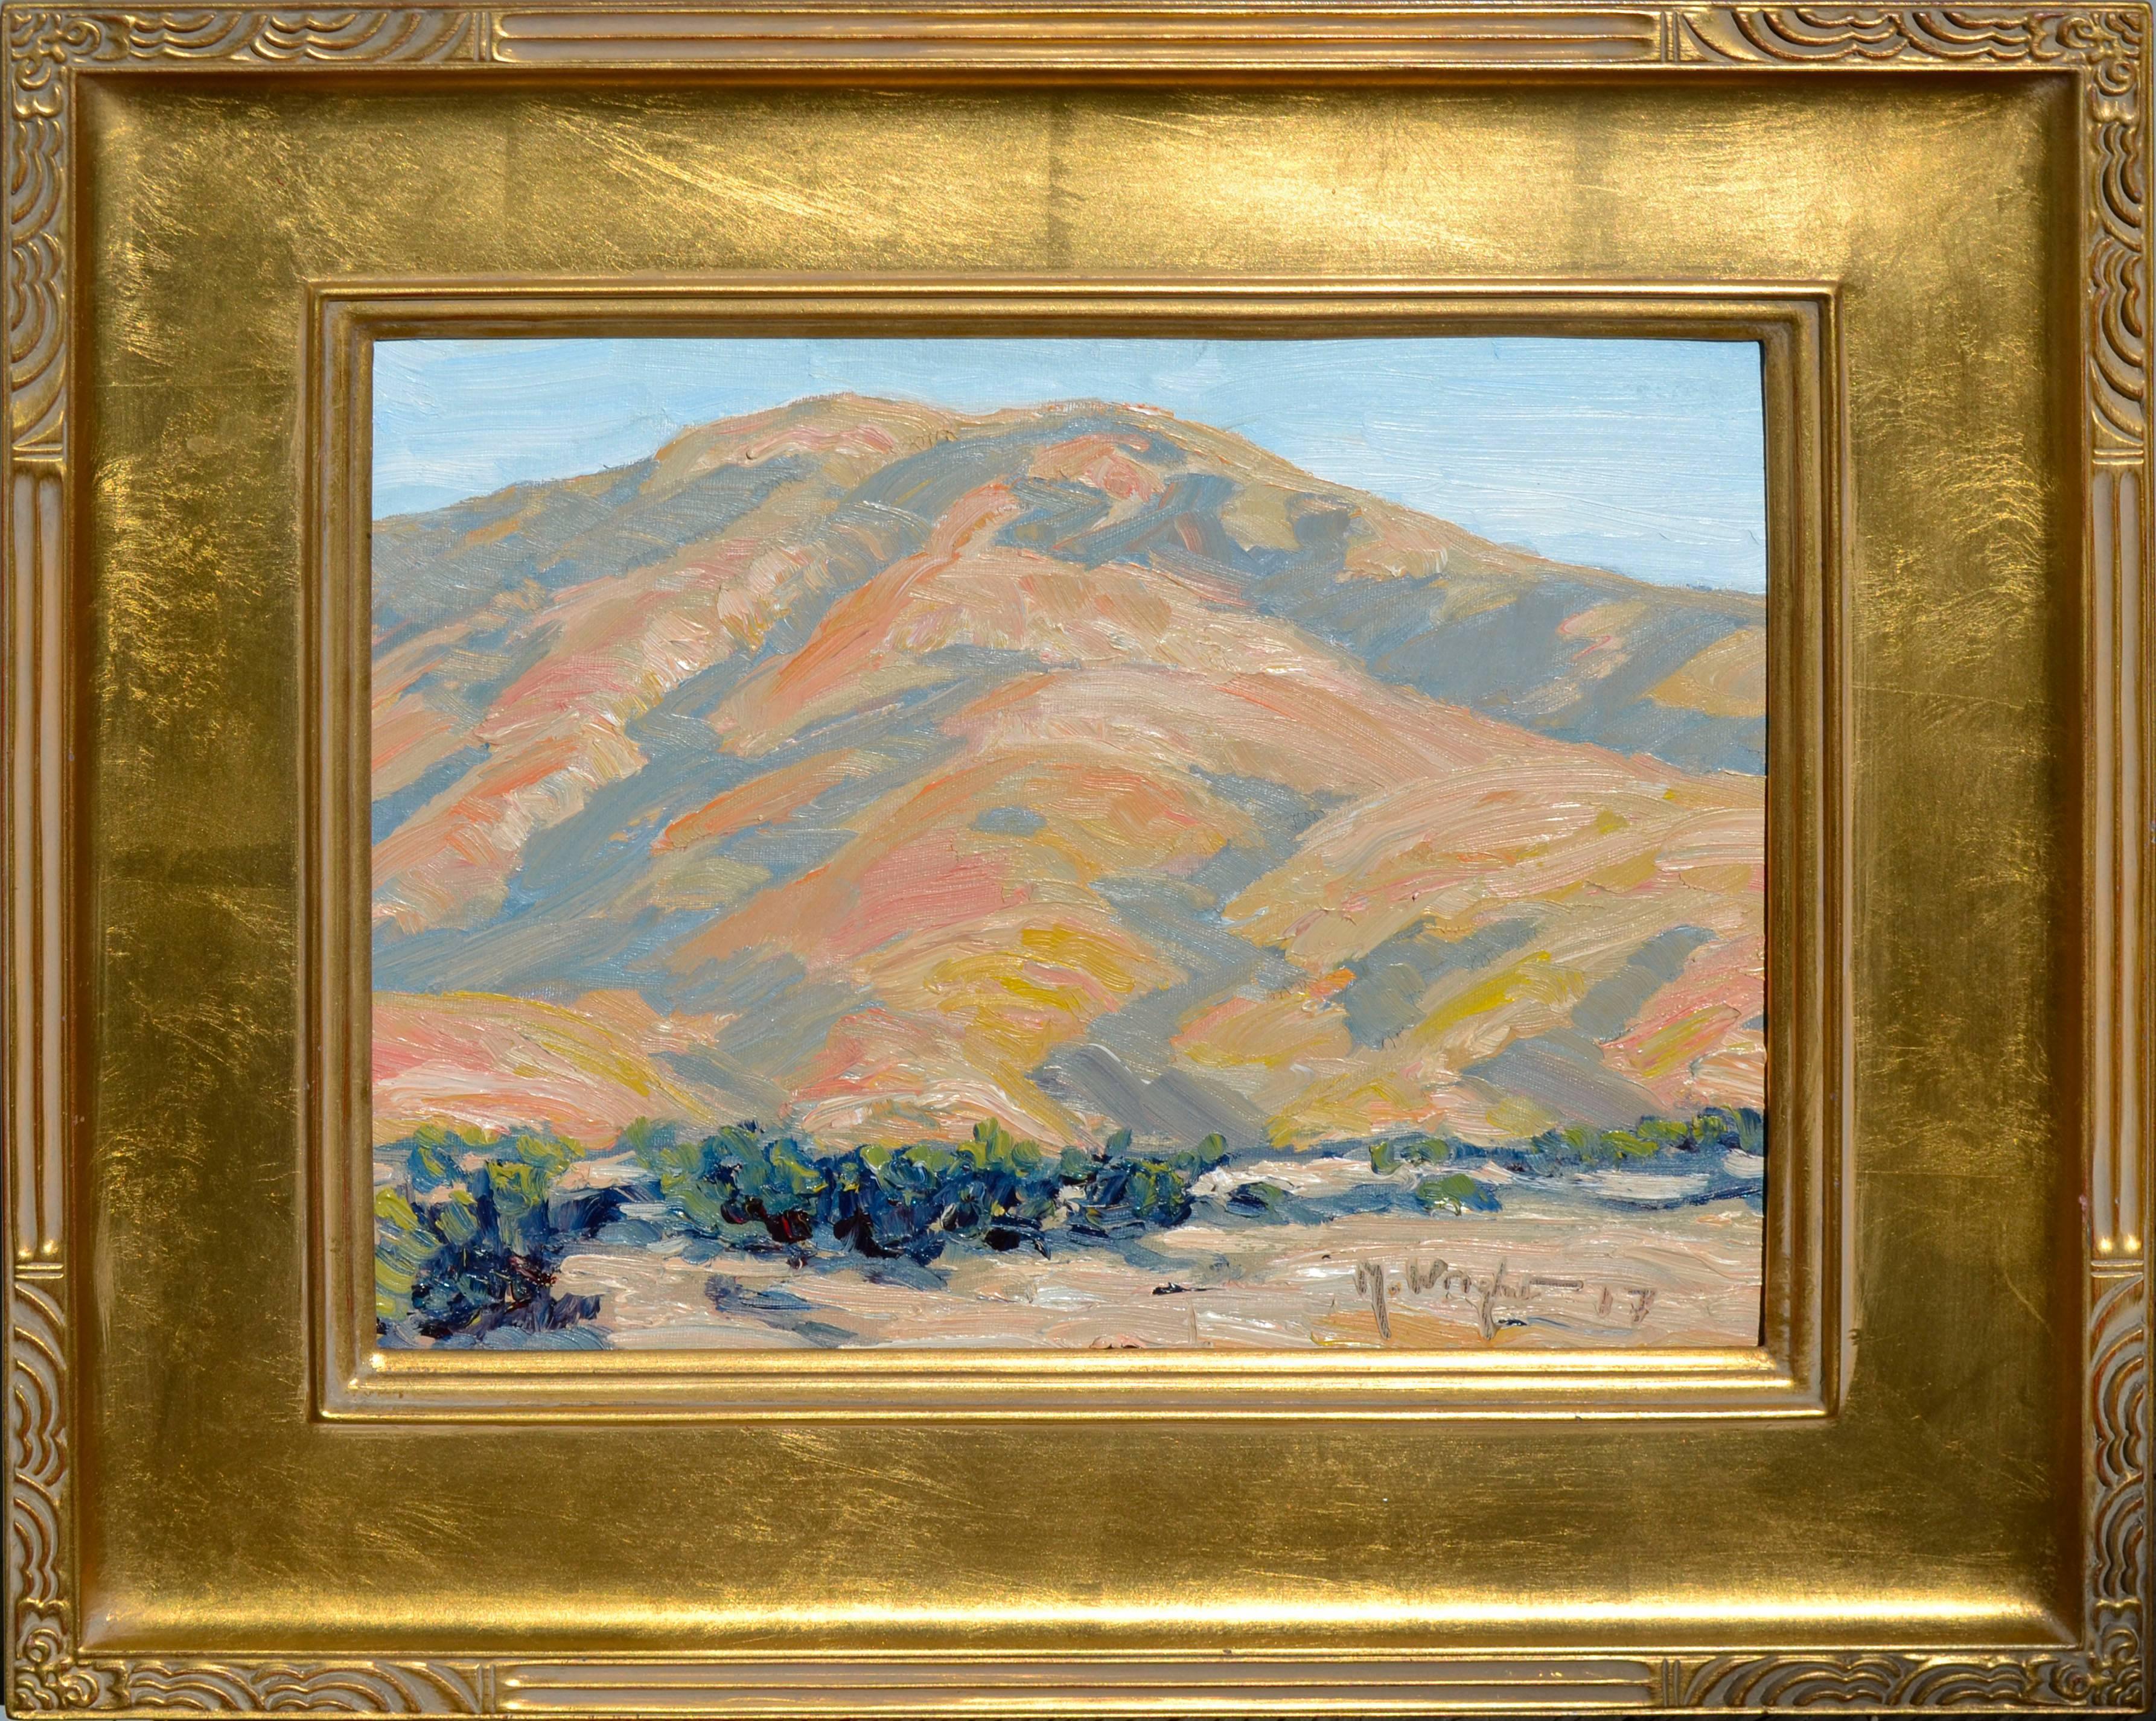 South of San Luis Obispo, California Landscape